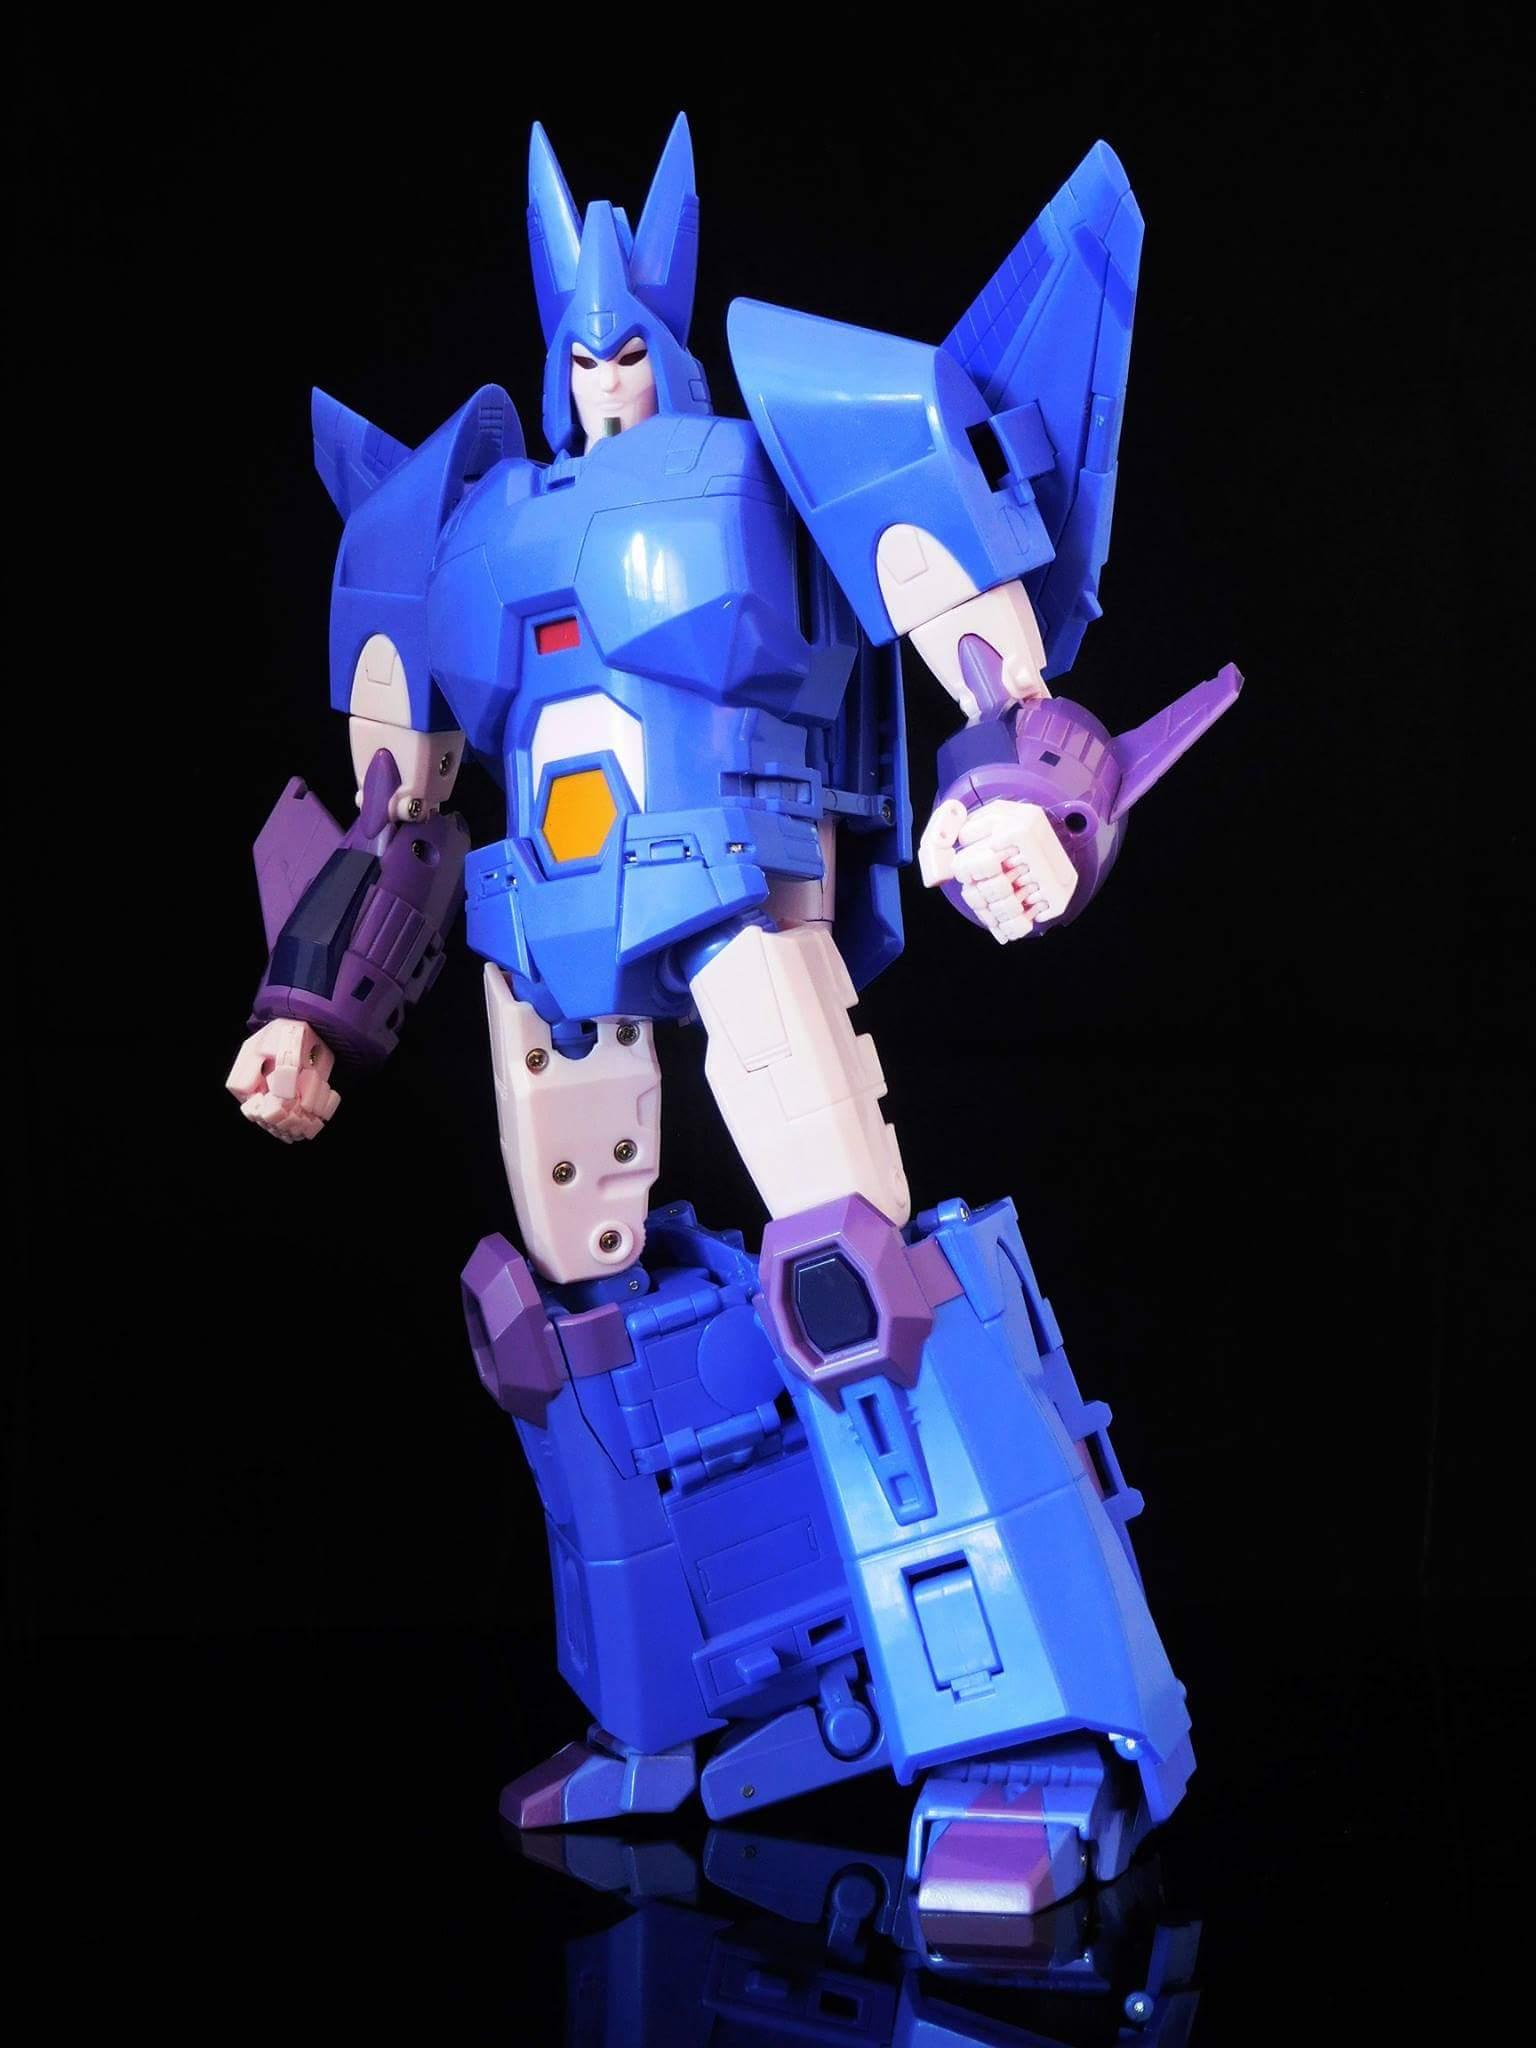 [X-Transbots] Produit Tiers - MX-III Eligos - aka Cyclonus - Page 2 DrcxI3Hn